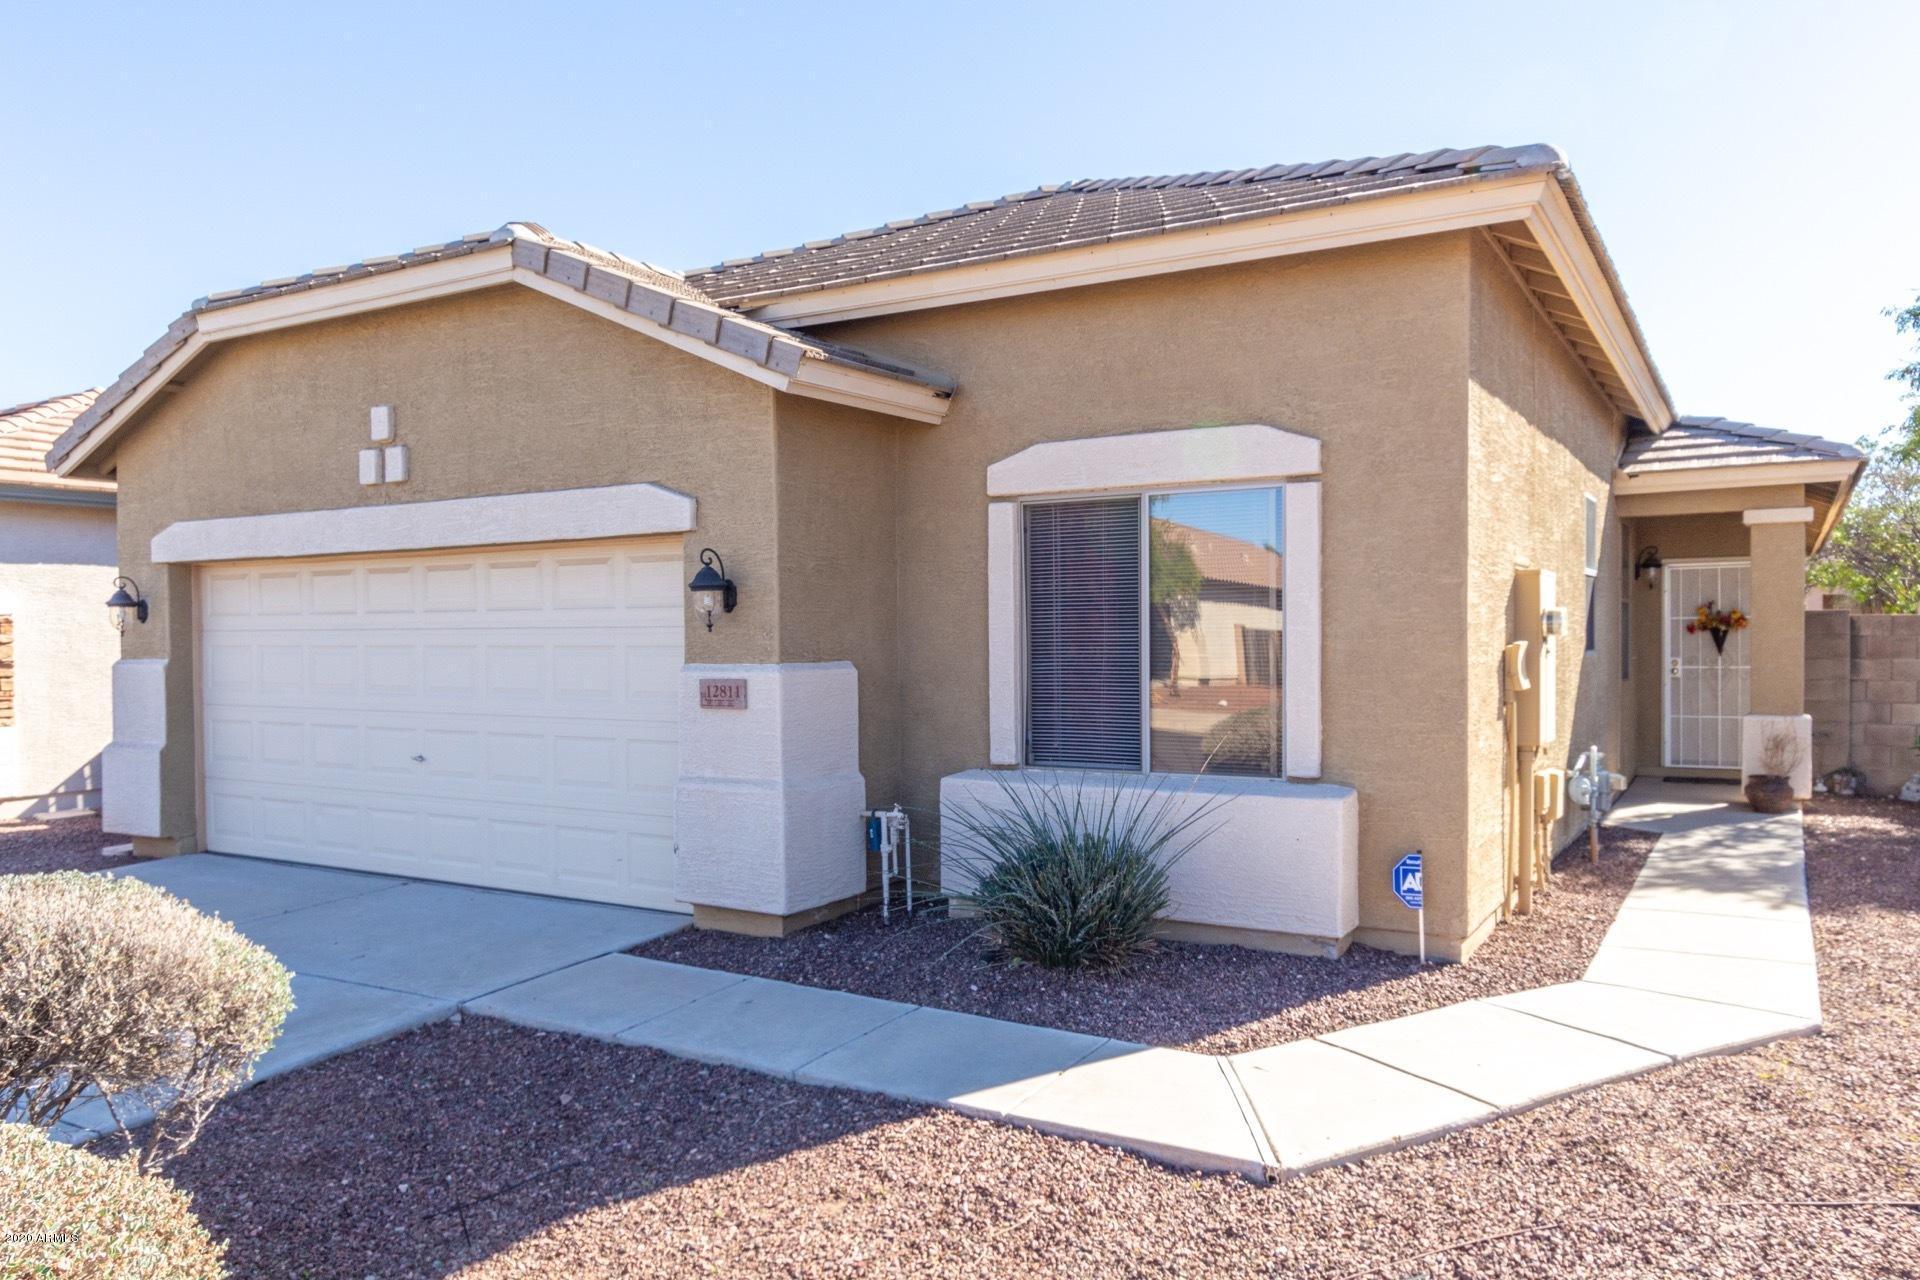 Photo of 12811 W REDONDO Drive, Litchfield Park, AZ 85340